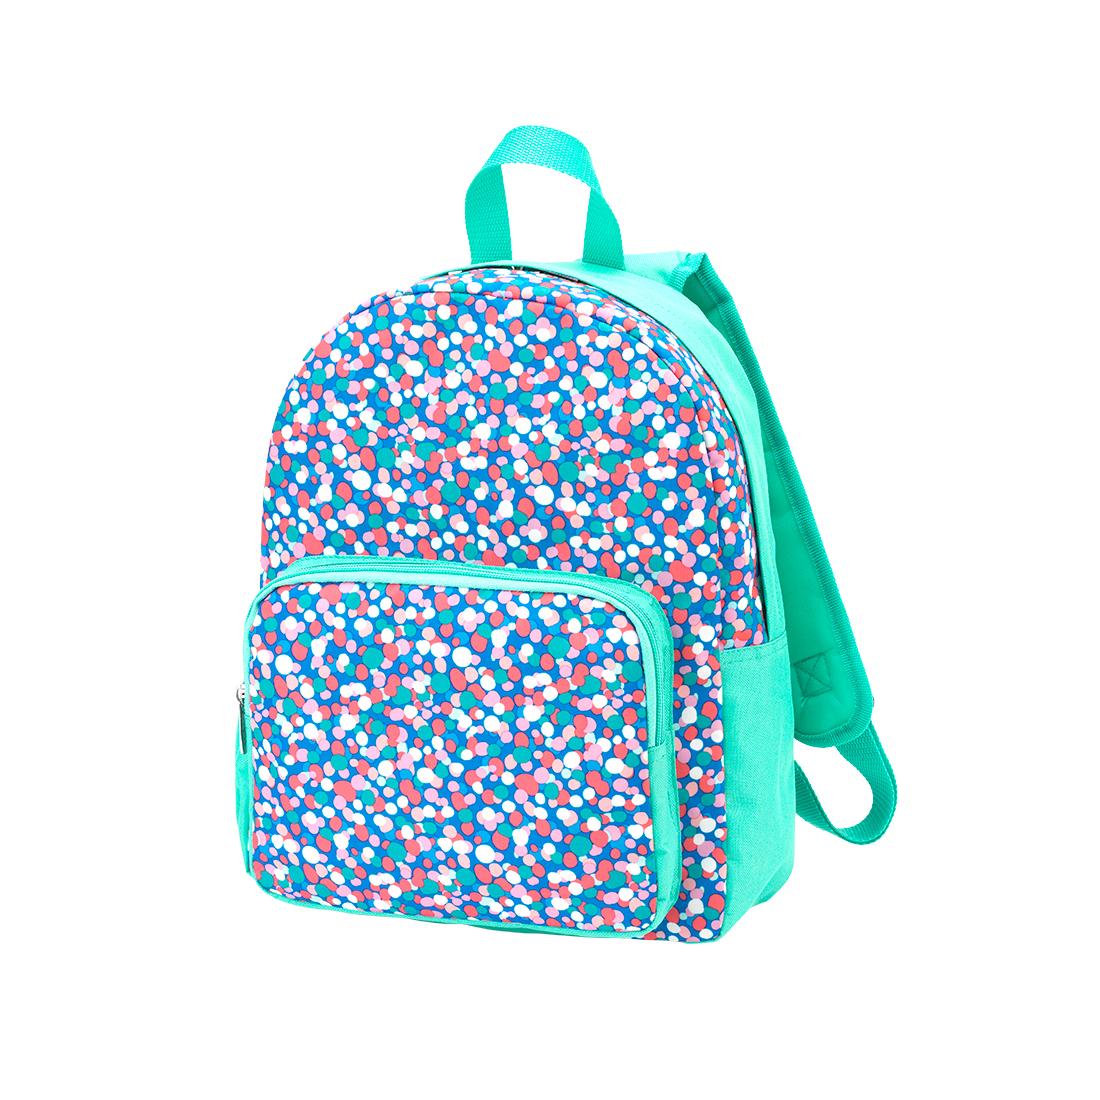 Monogram Preschool Backpack   Personalized Backpacks for Toddlers